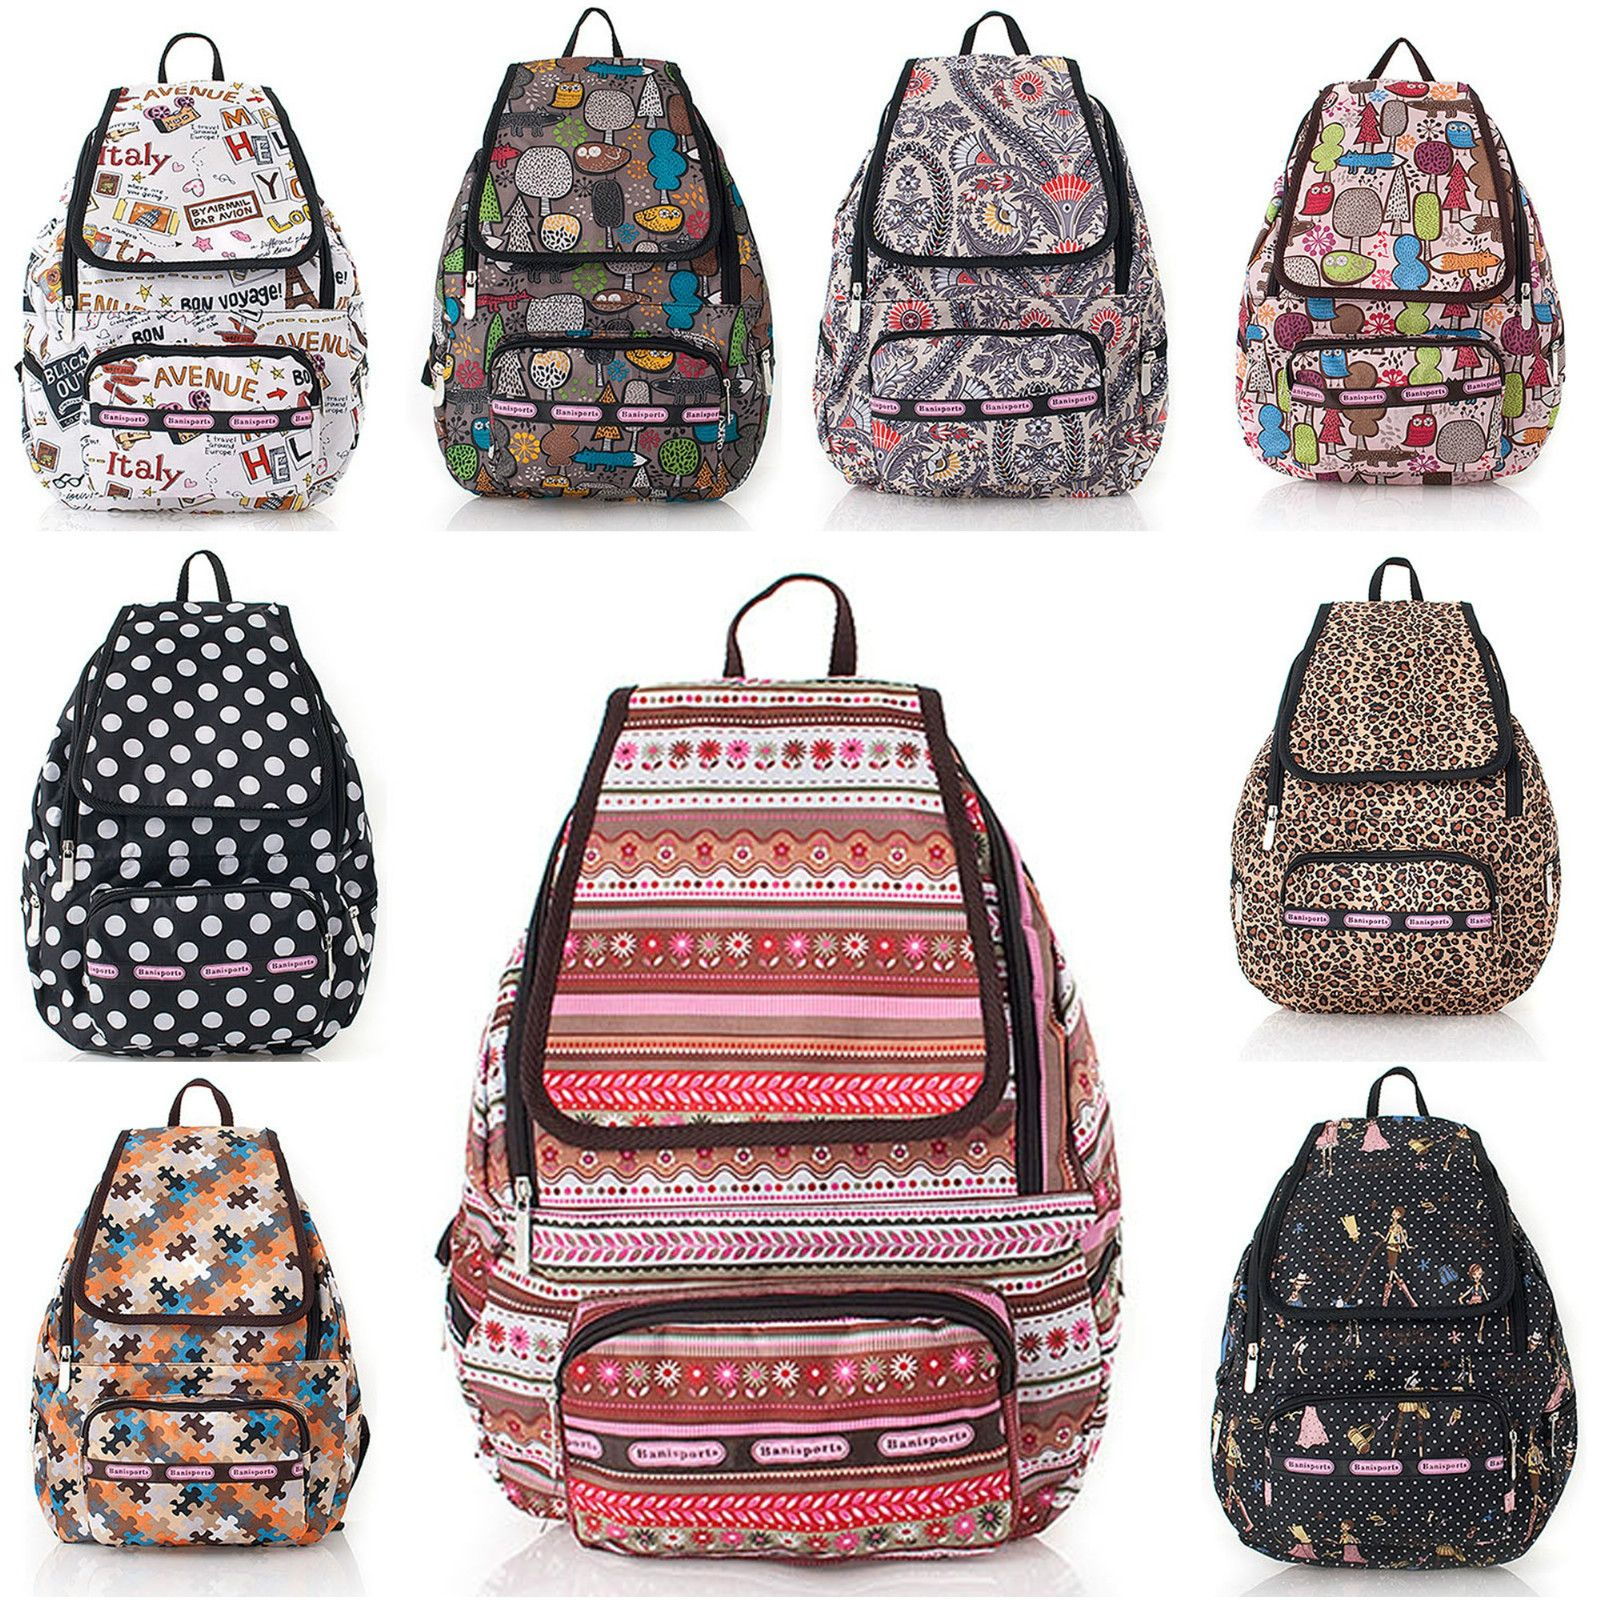 Women's Ladies Backpack Fashion Designed Patterns Book Bag School ...